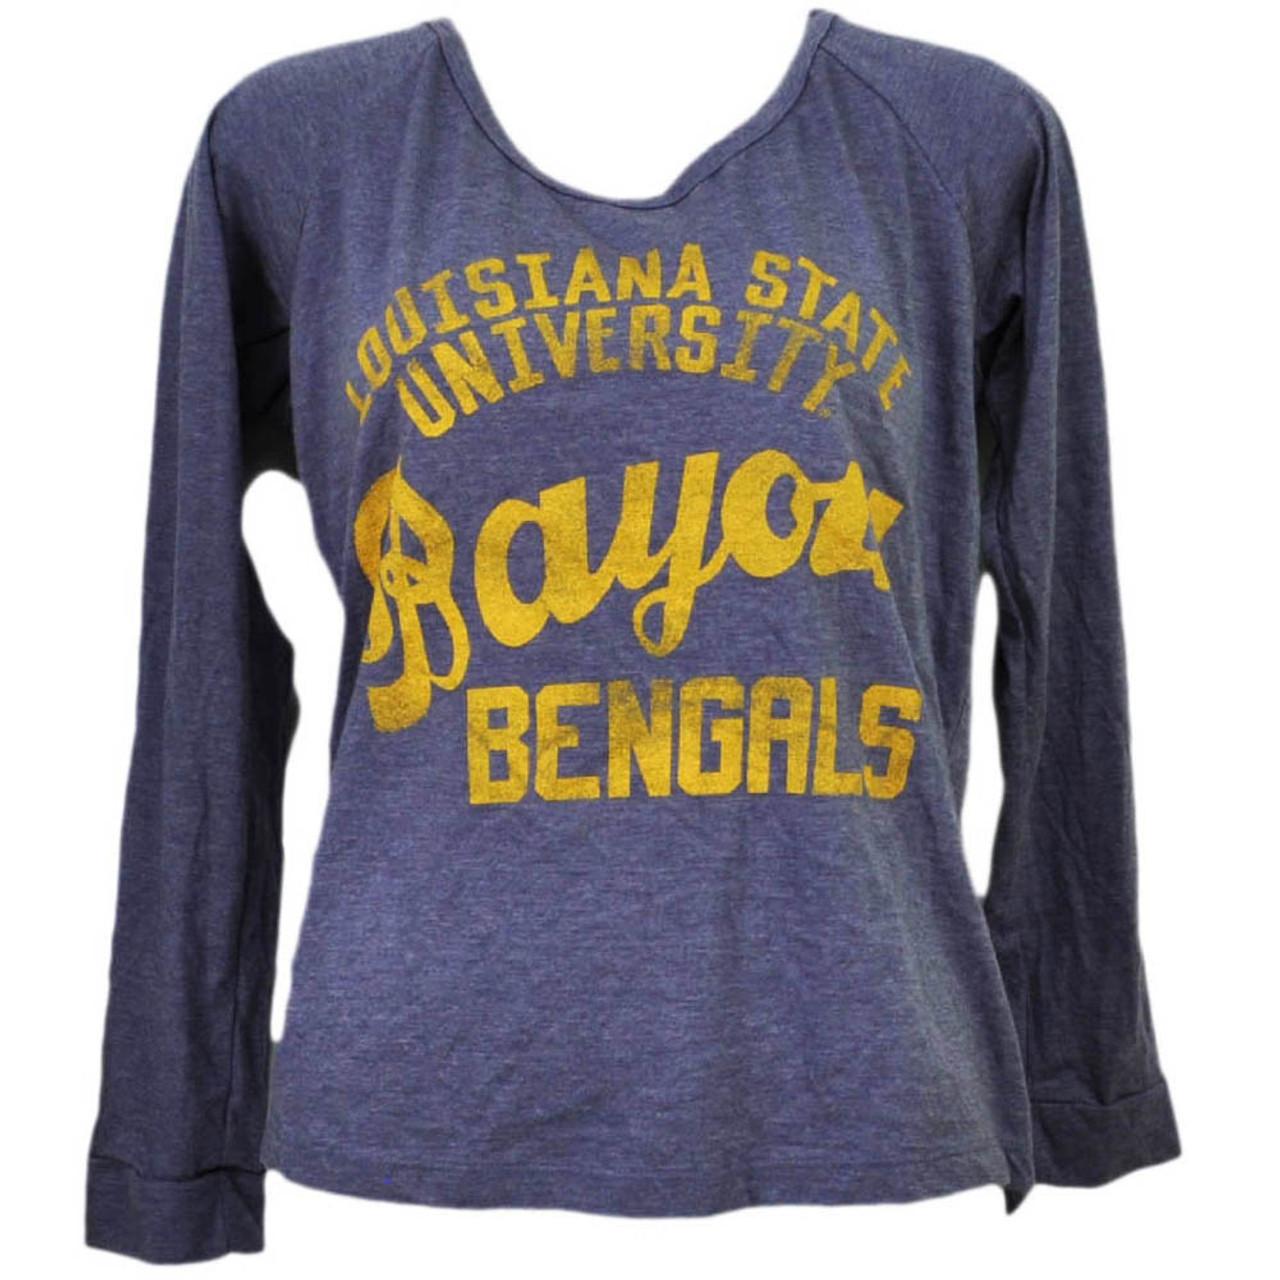 56c273921 NCAA Louisiana State Tigers LSU Bayou Bengals Womens Purple Long Sleeve  Tshirt - Cap Store Online.com